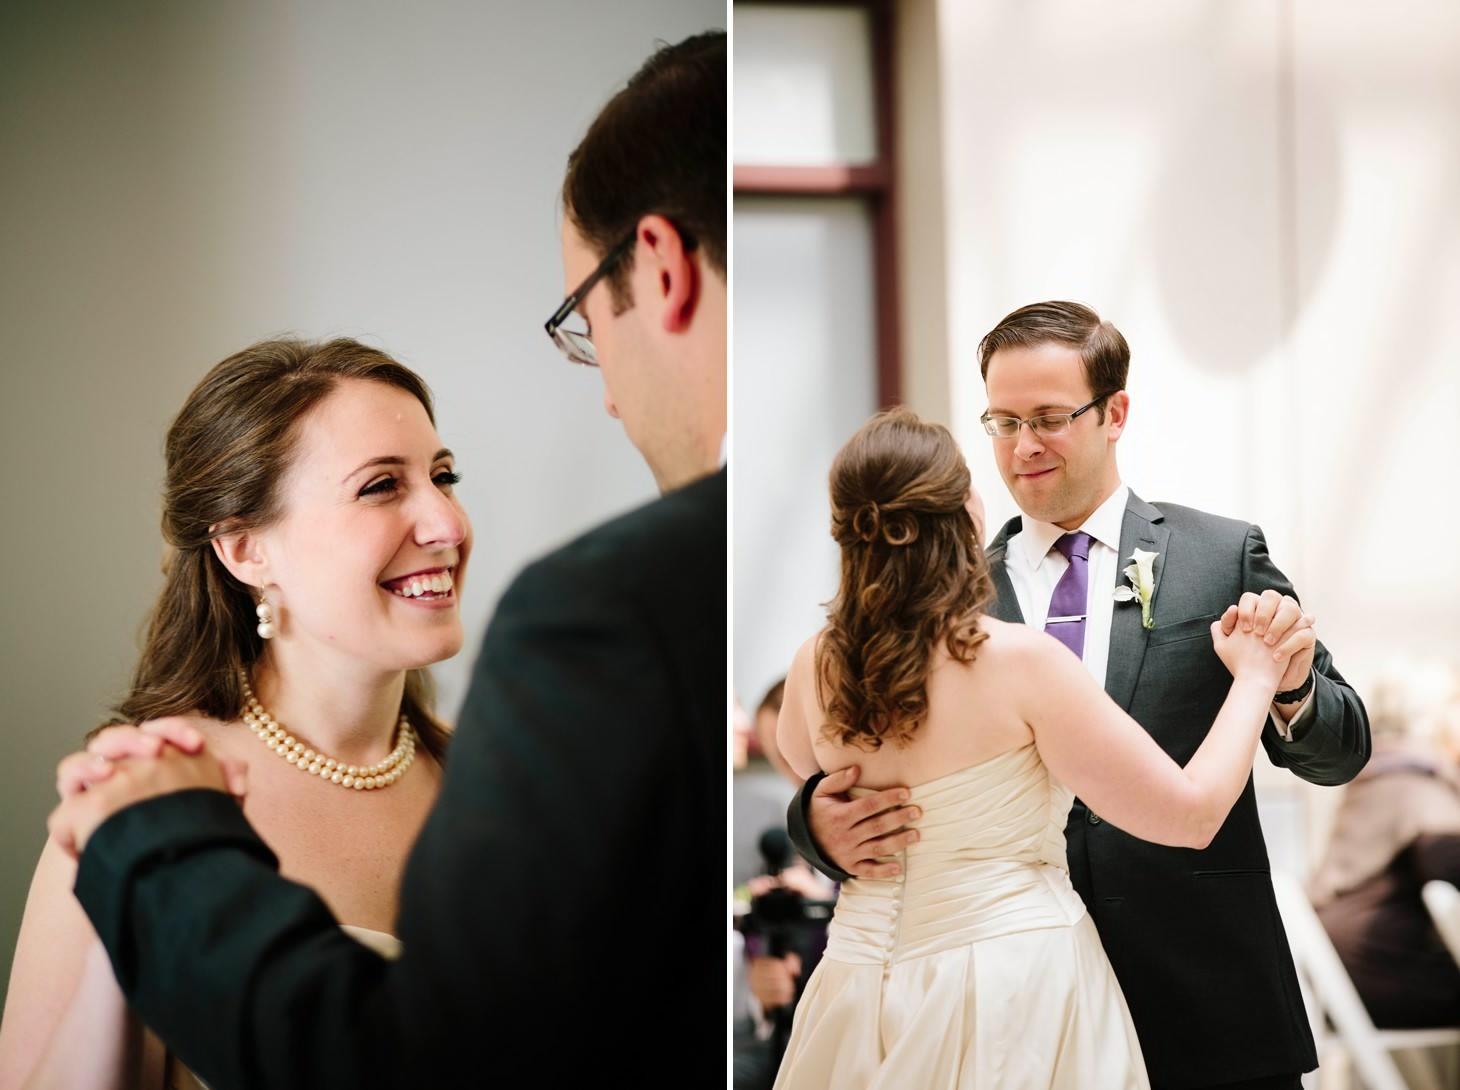 053-nyc-wedding-photographer-hoboken-waterfront-wedding-photos-smitten-chickens.jpg